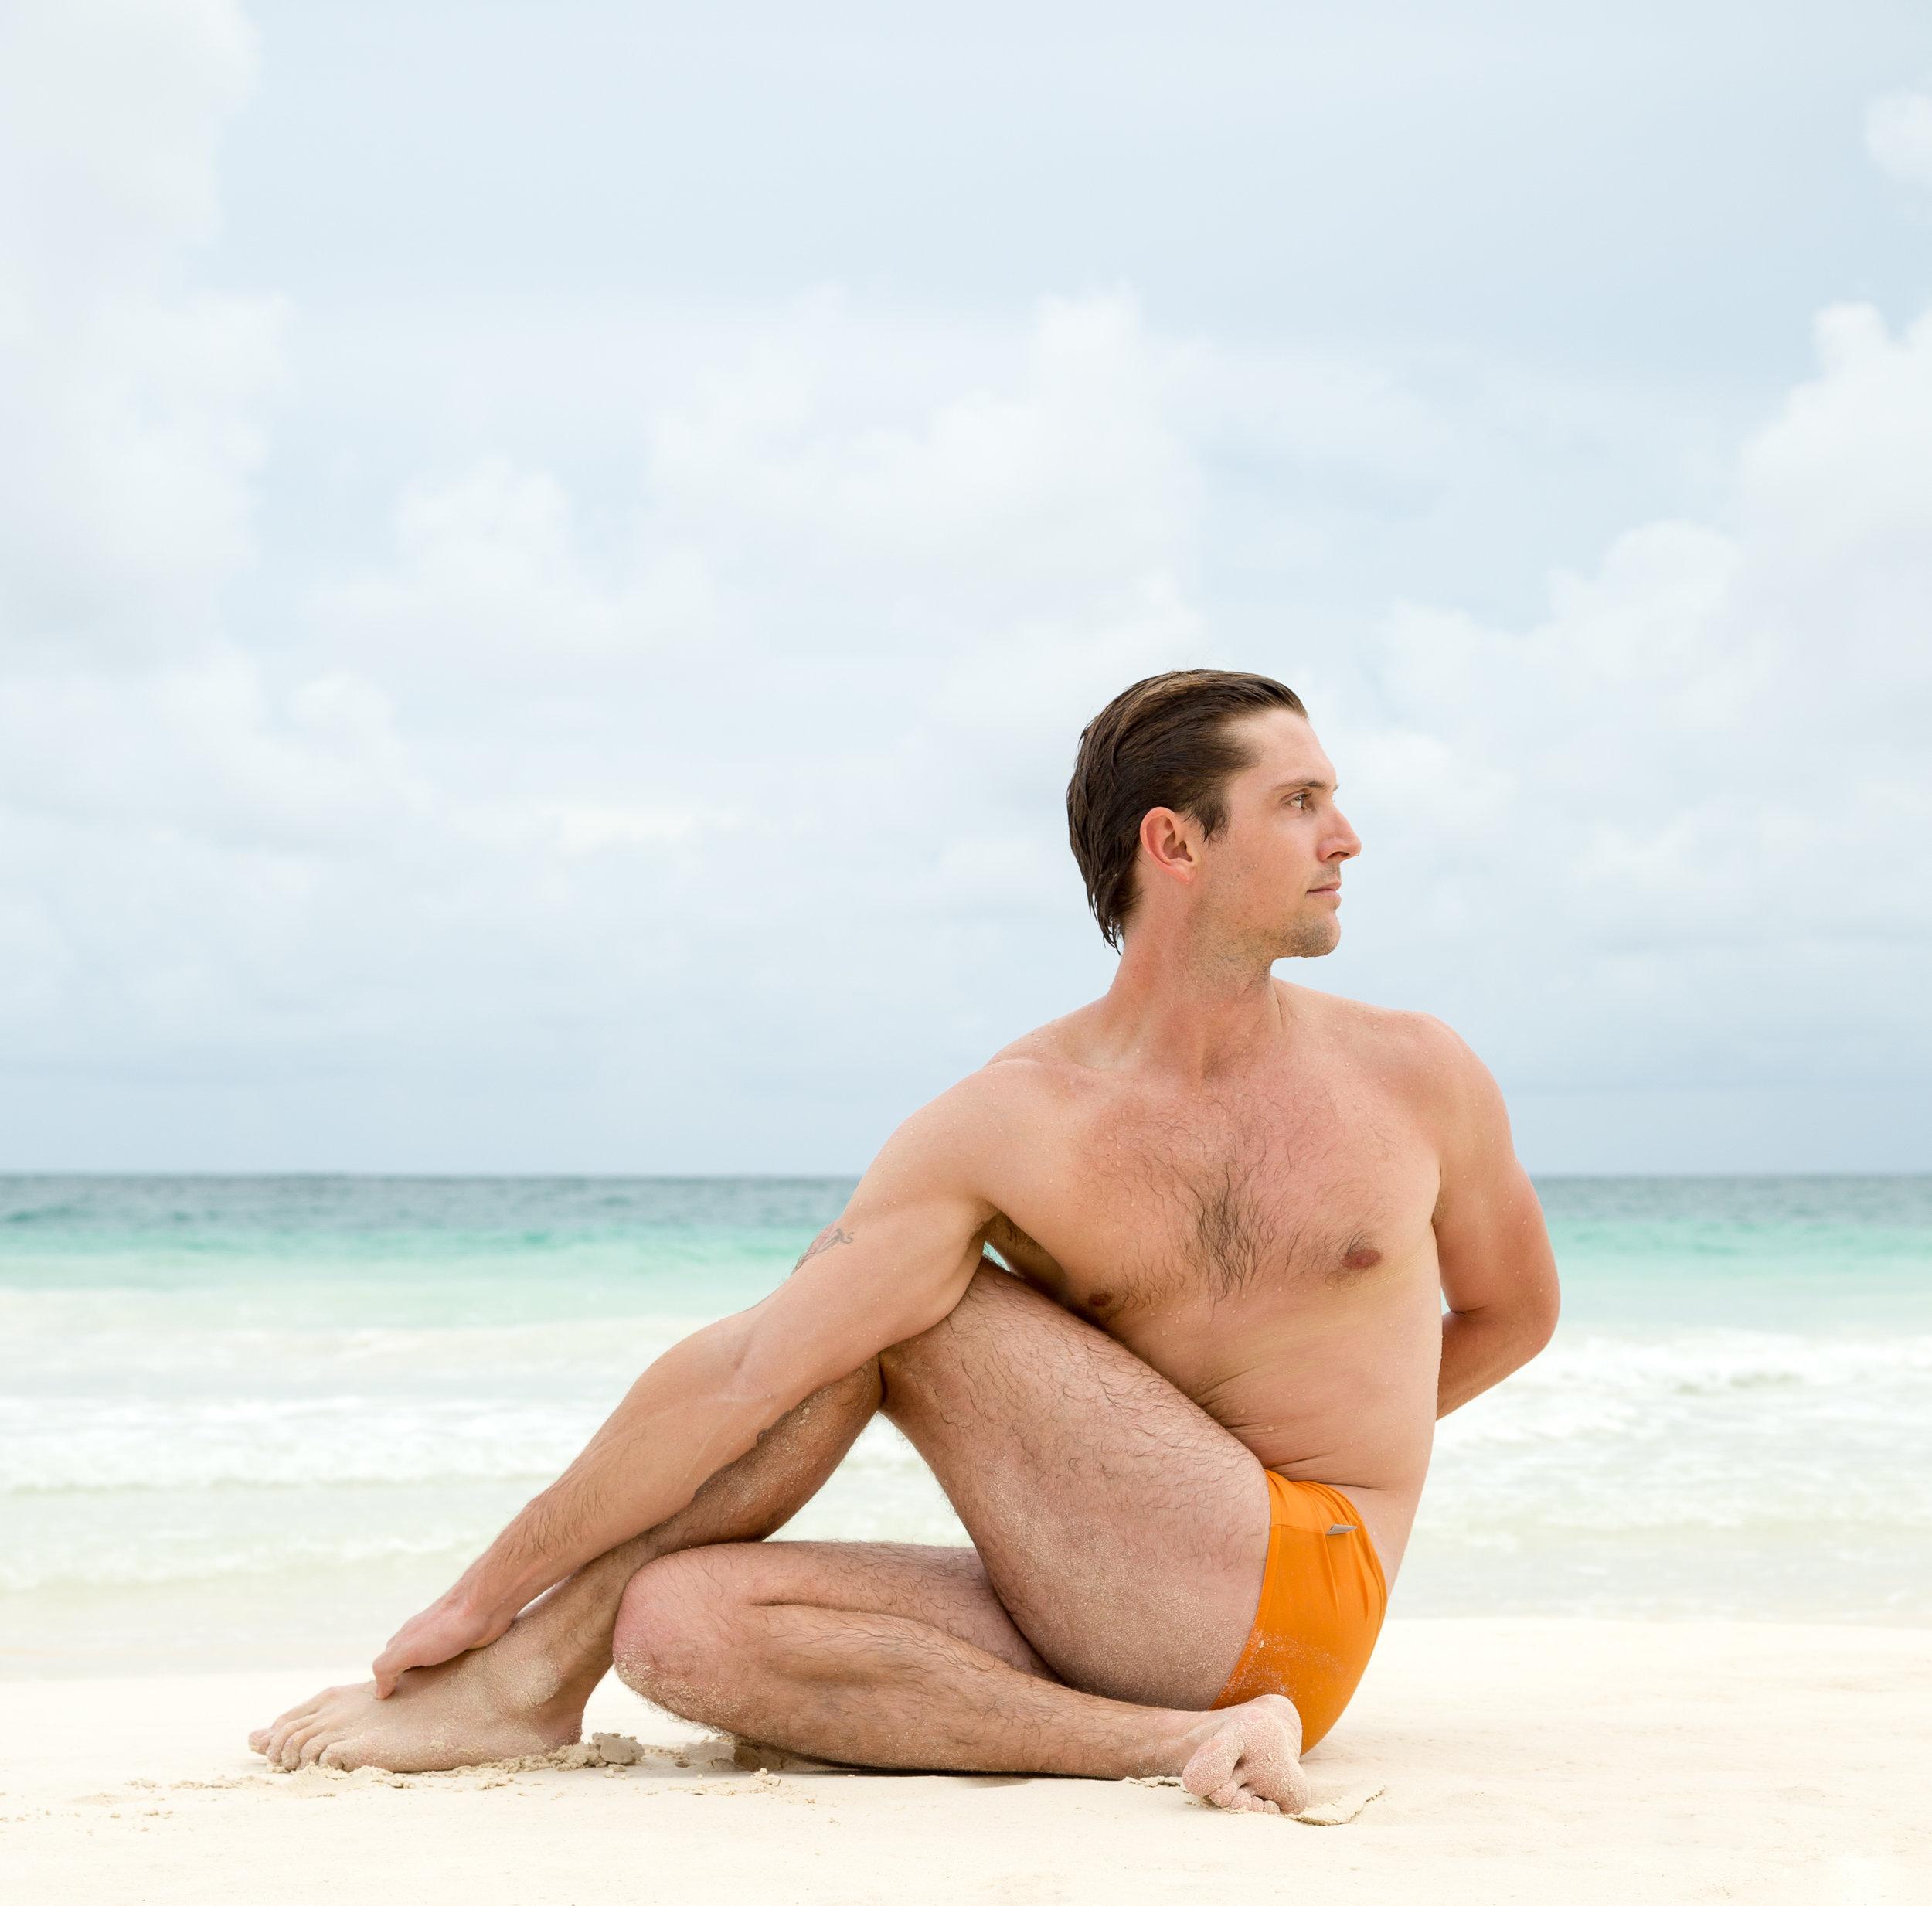 Dustin McCallister Yoga Ardha Matsyendrasana